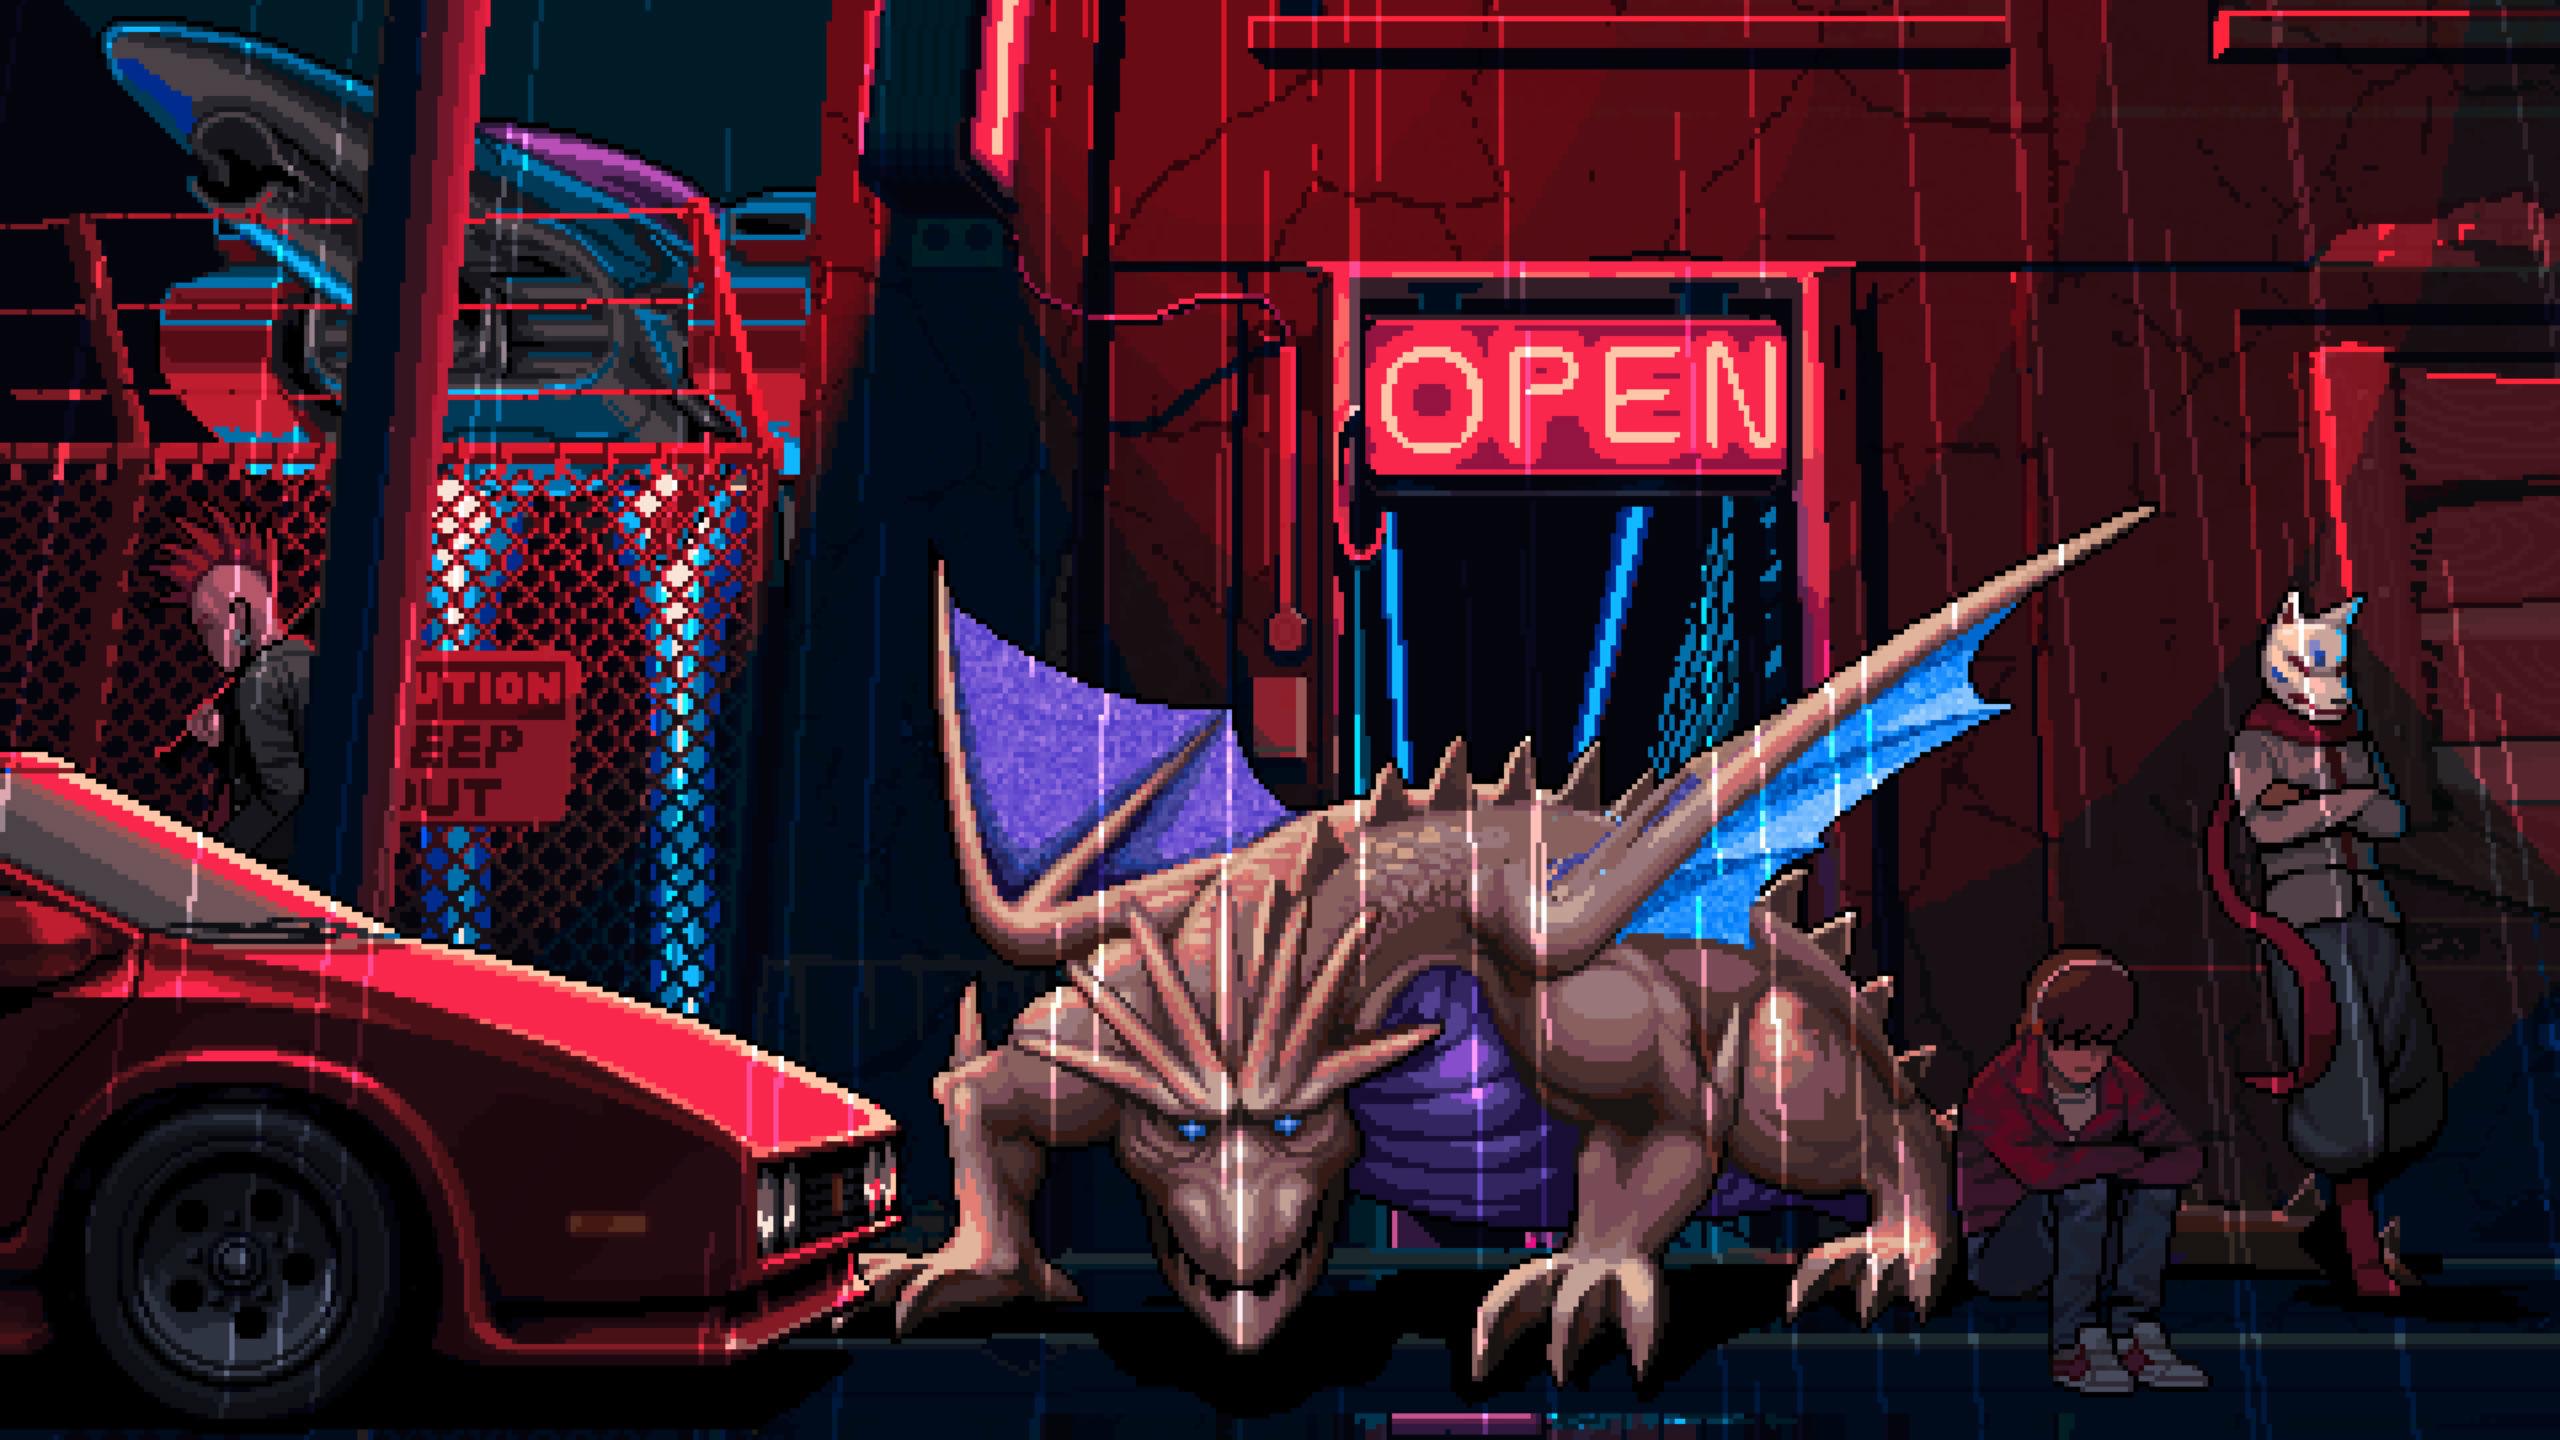 General 2560x1440 198x 1980s pixel art retro style Hi-Bit Studios video game art video games dragon car open